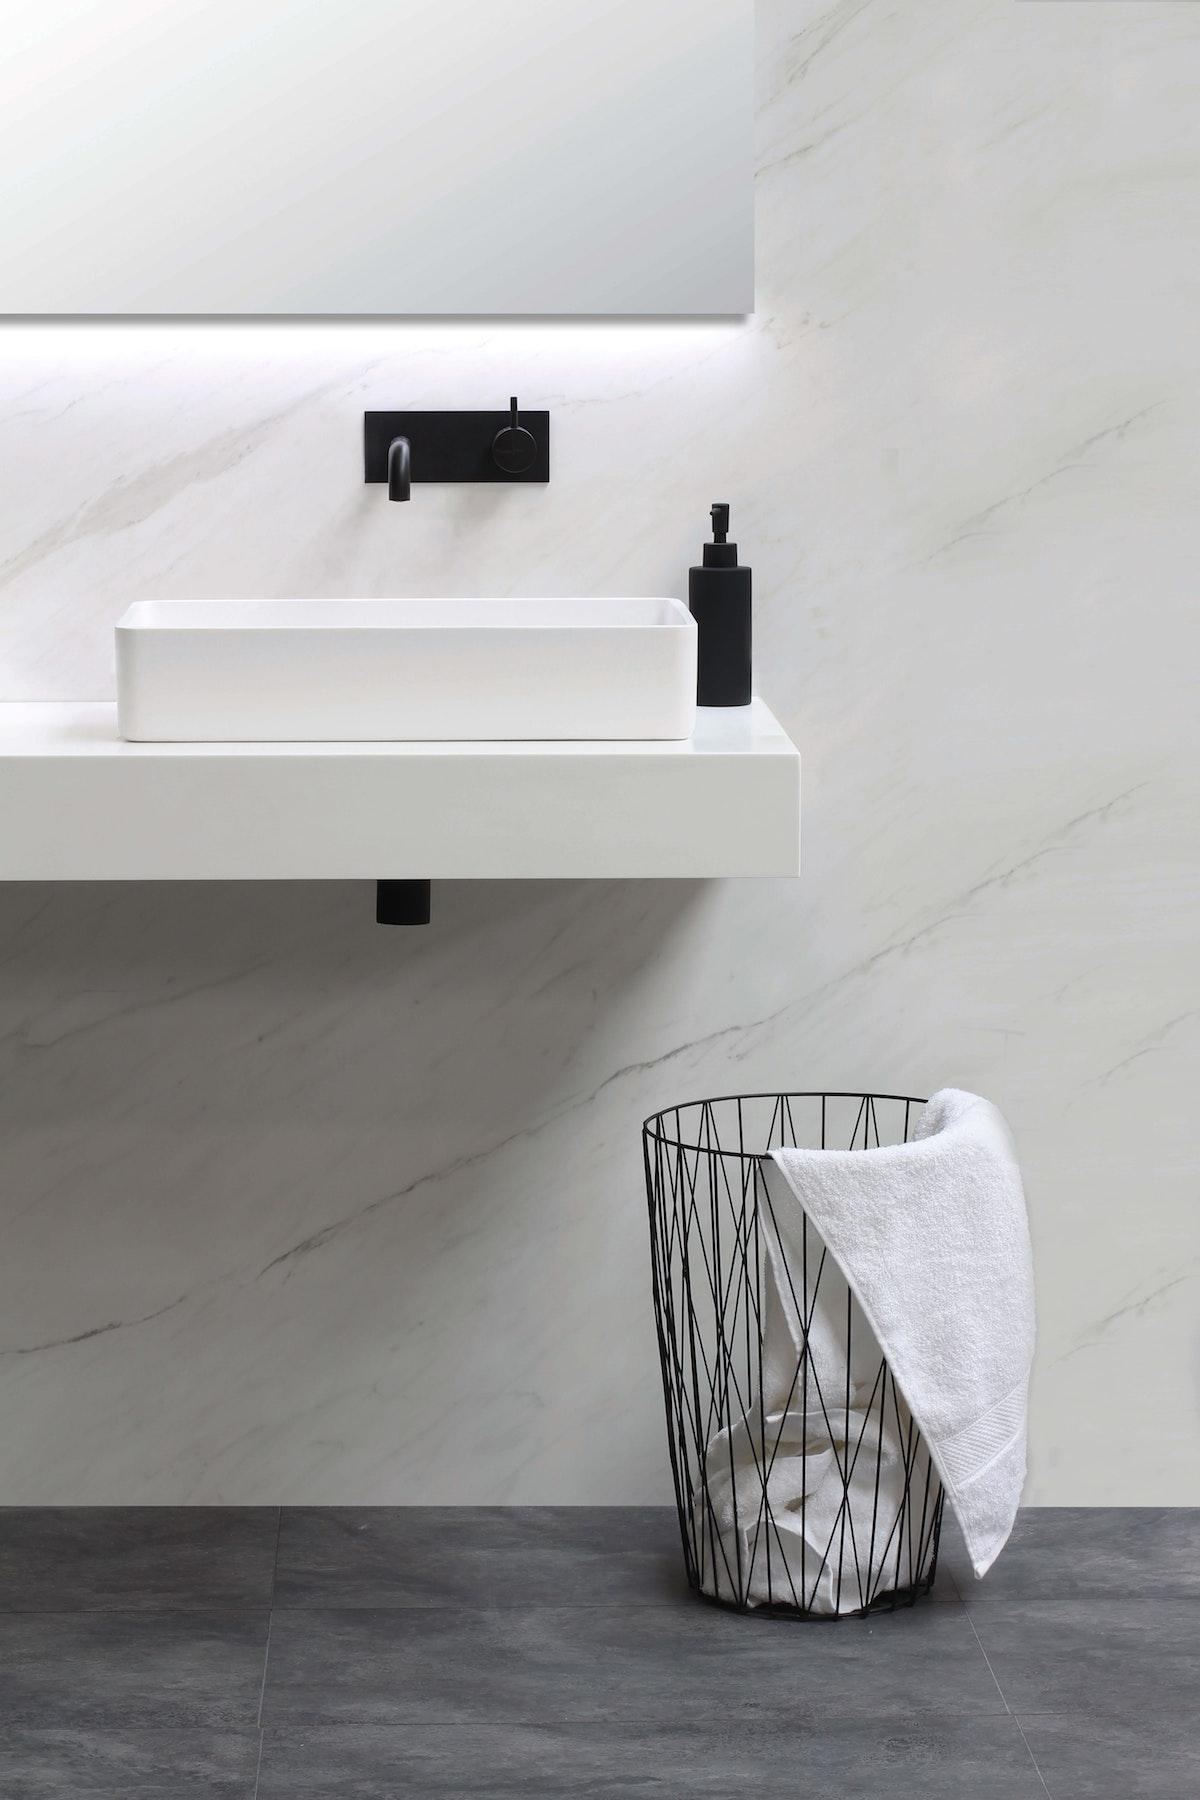 Square White Bathroom Sink